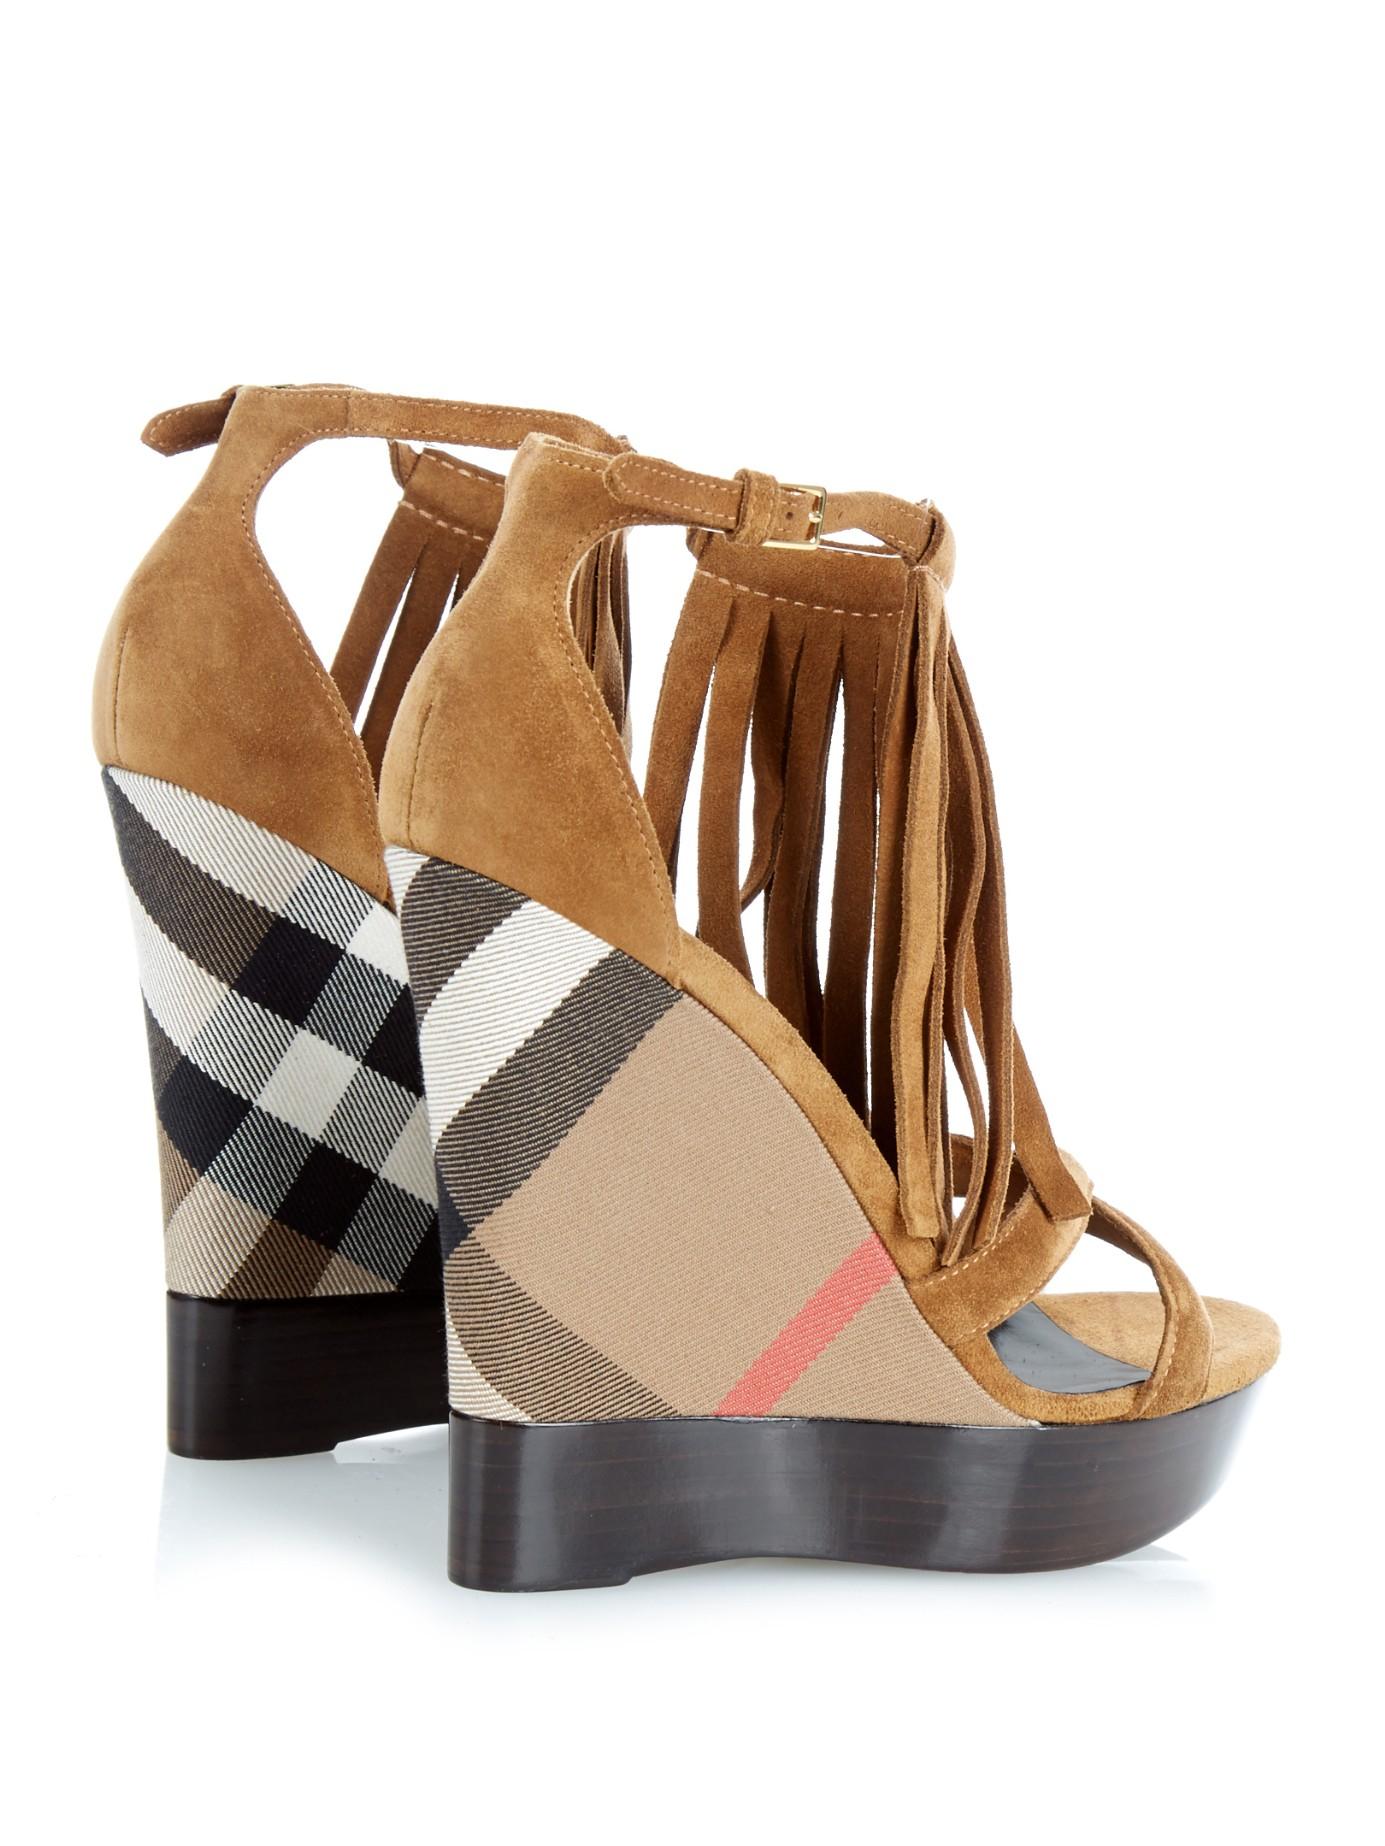 Gallery - Burberry Minstead Suede Fringed Wedge Sandals In Brown Lyst